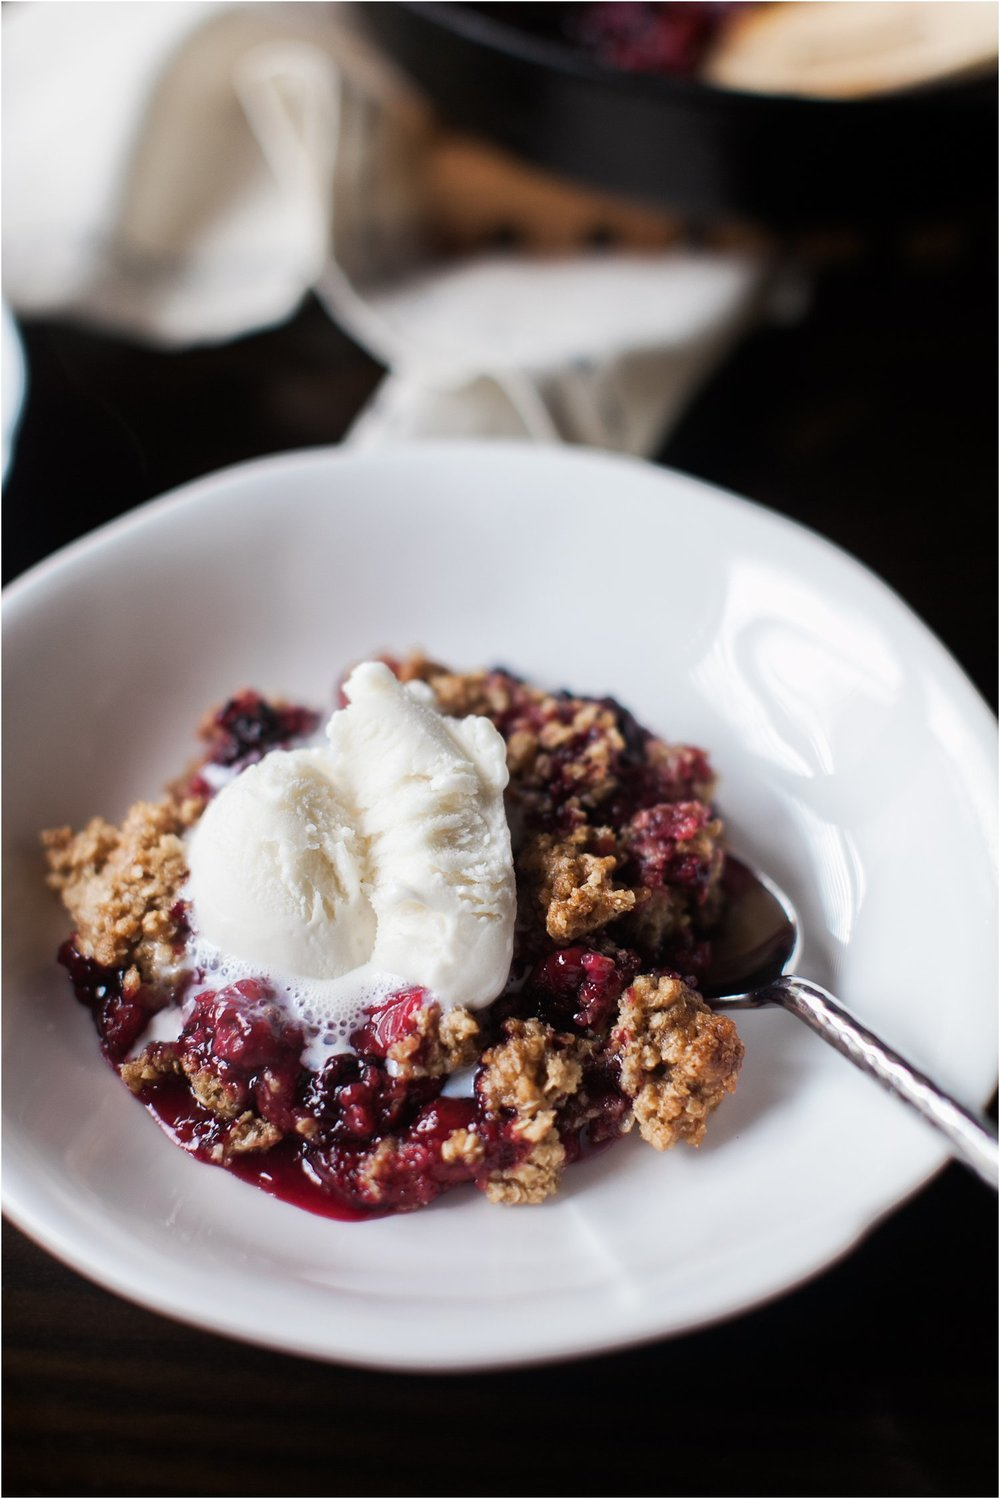 Gluten Free Blackberry & Strawberry Crumble | Feast & Dwell